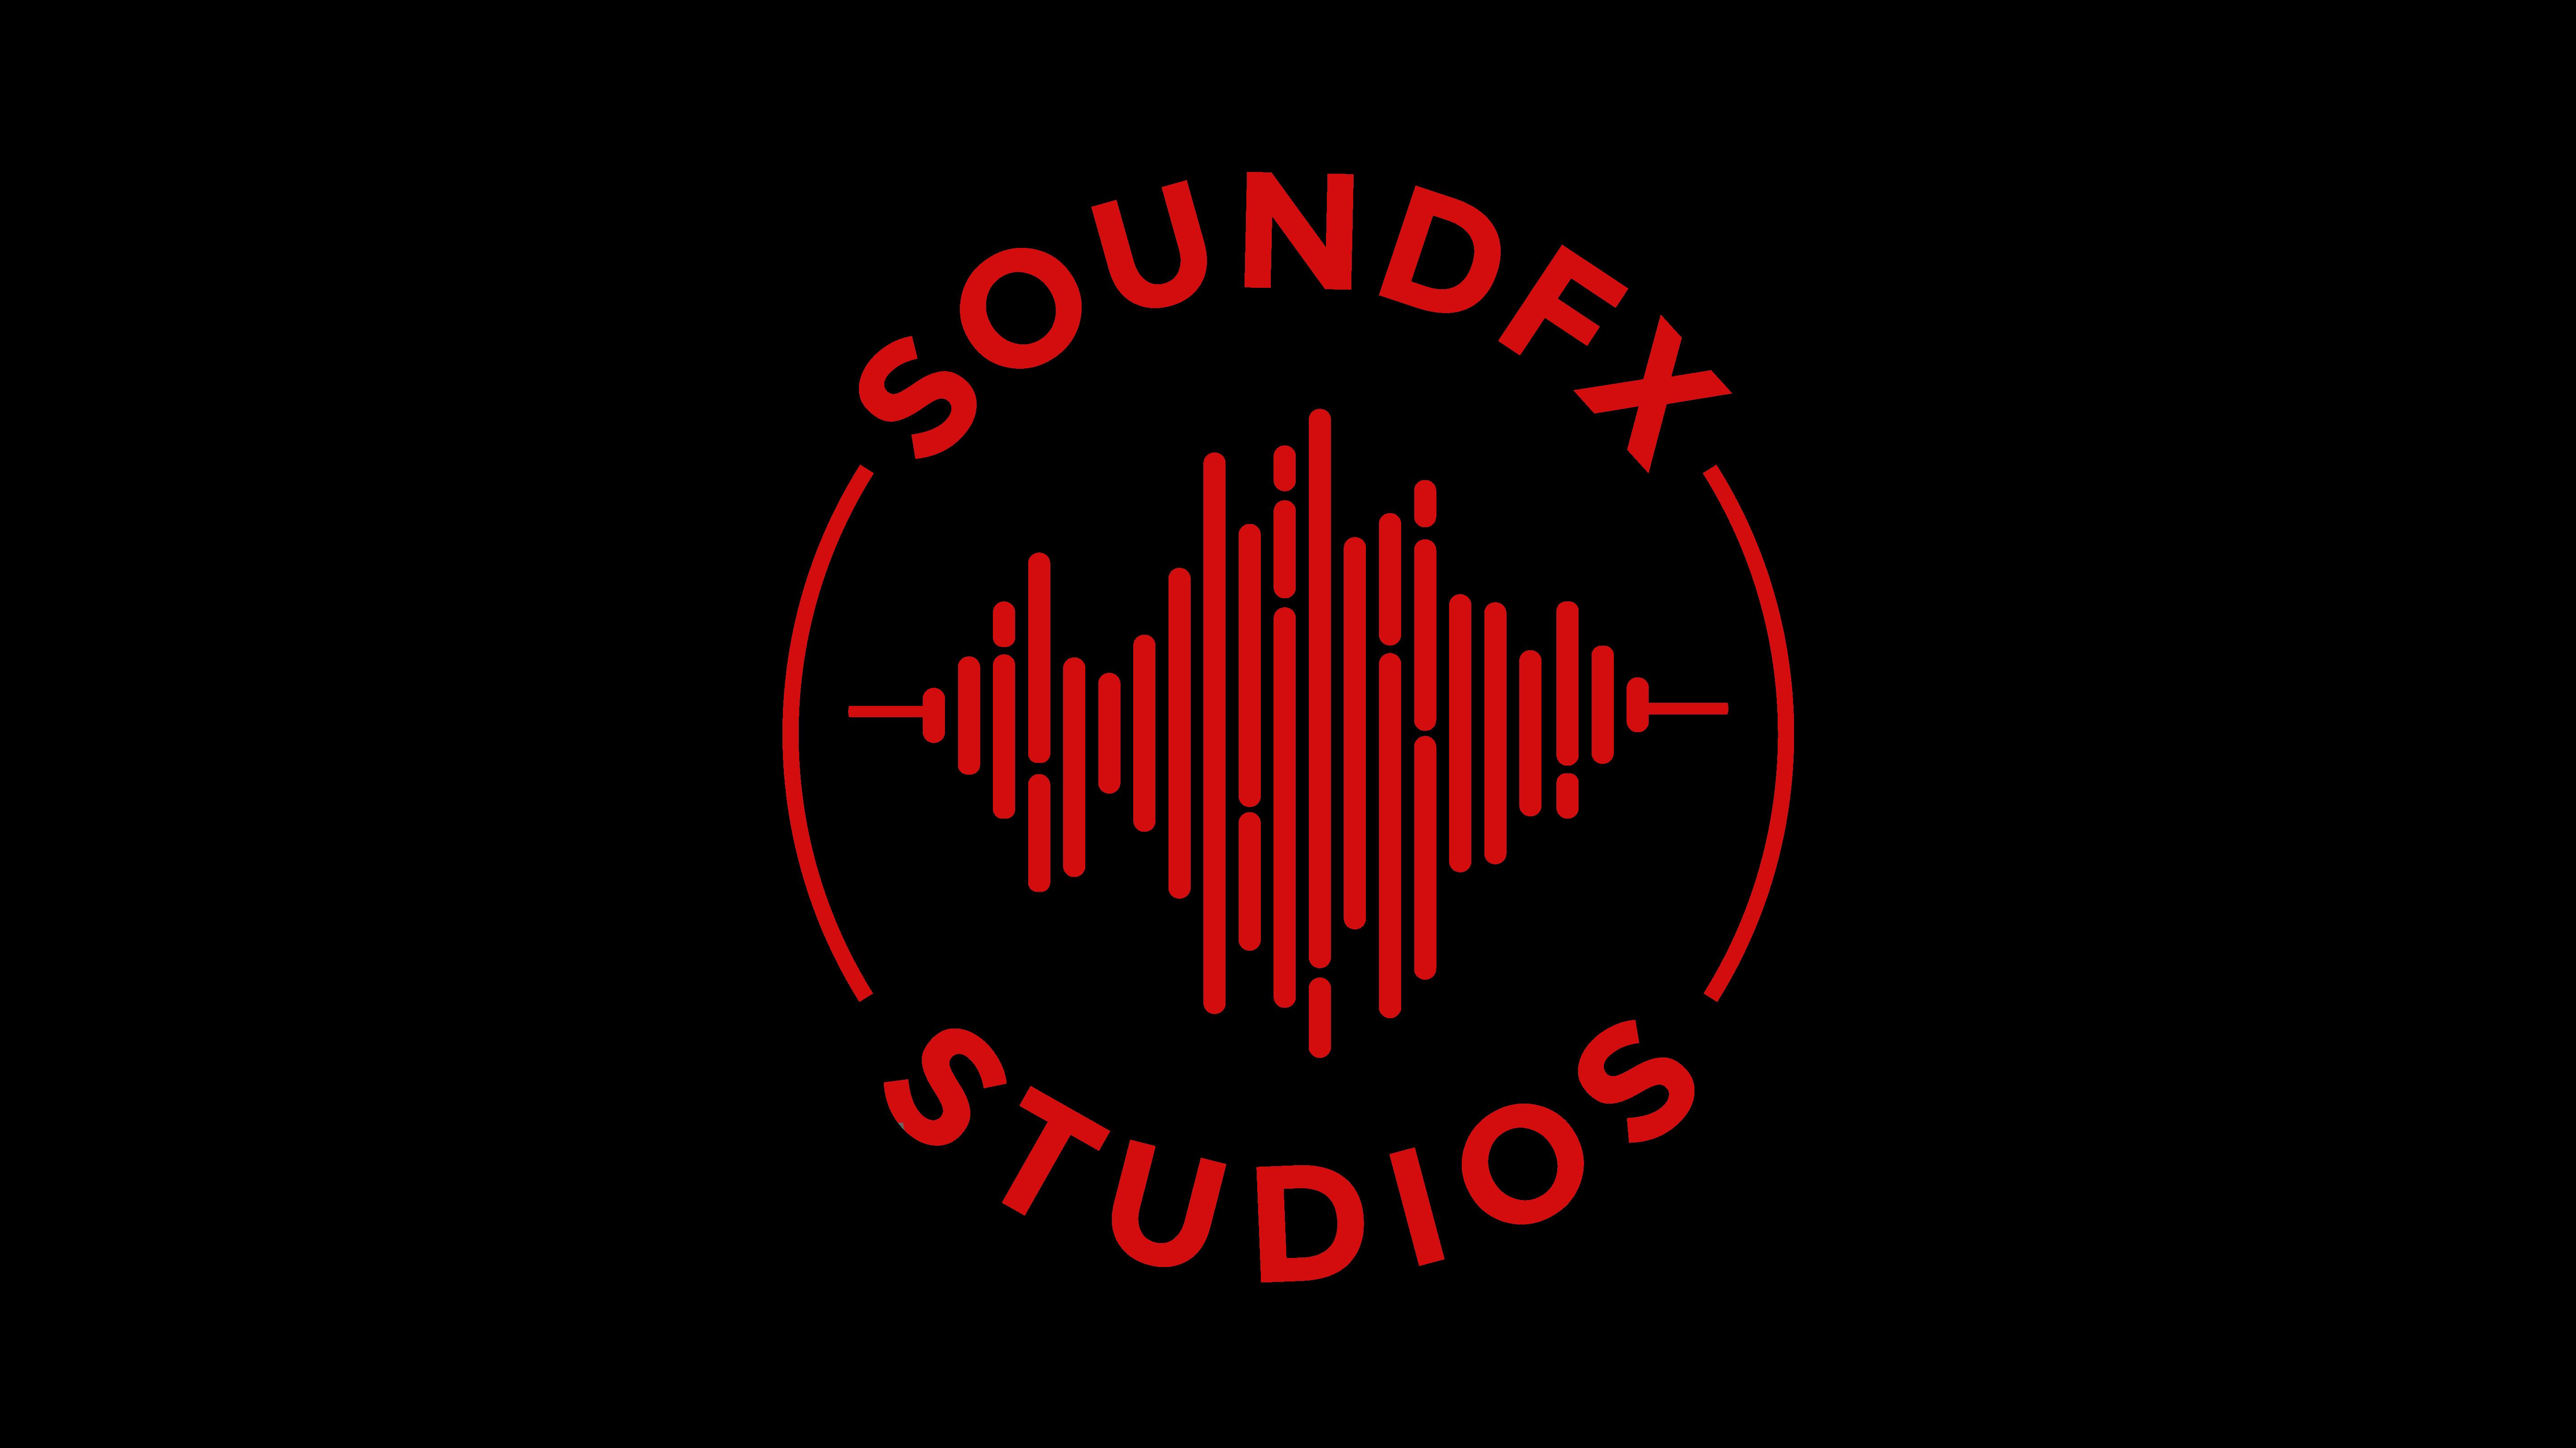 SoundFX Studios